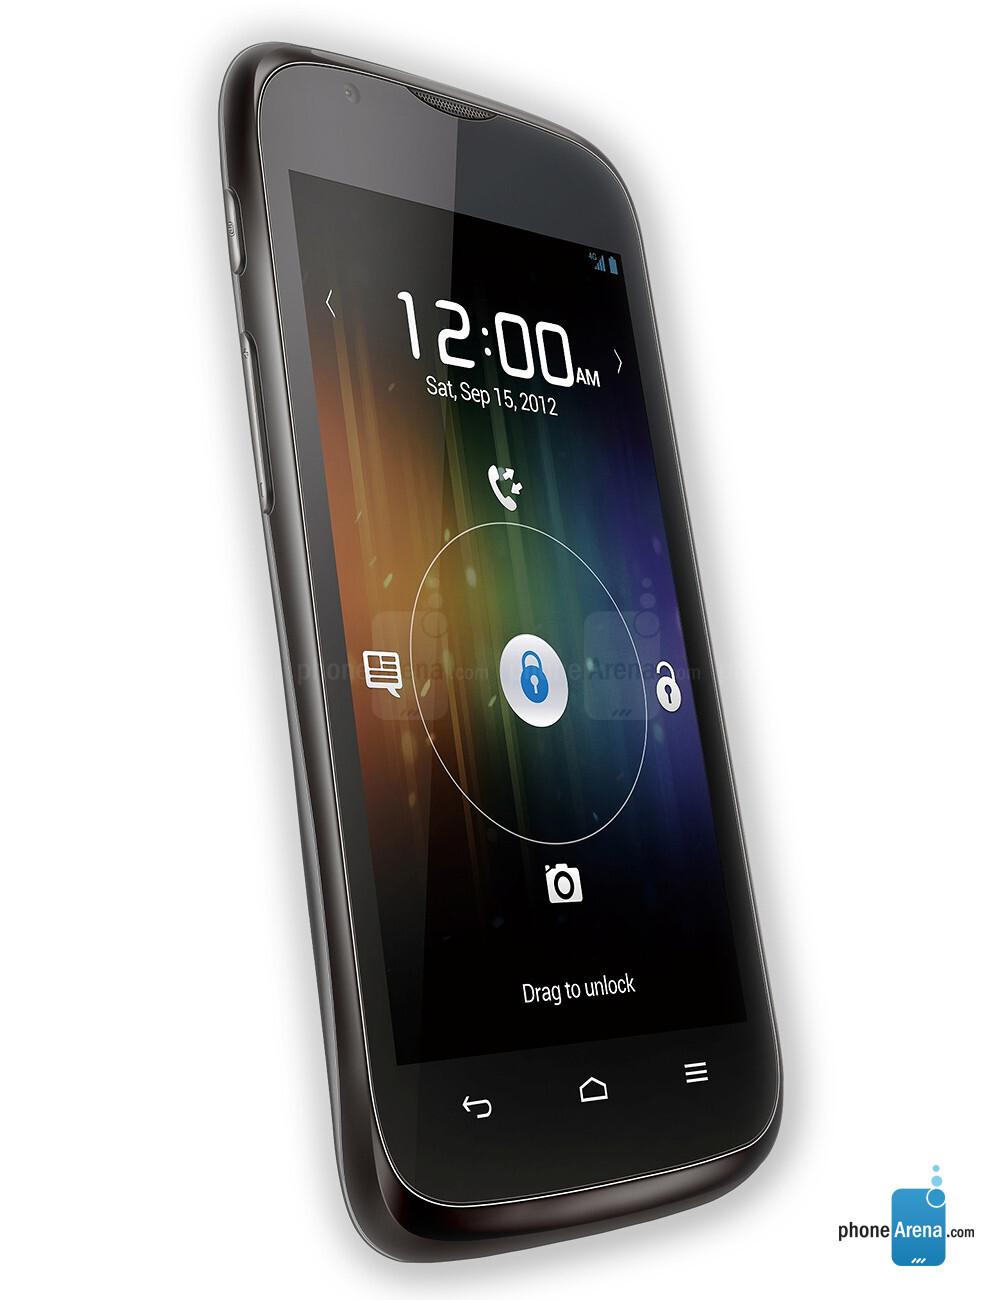 Huawei Ascend P1 LTE specs